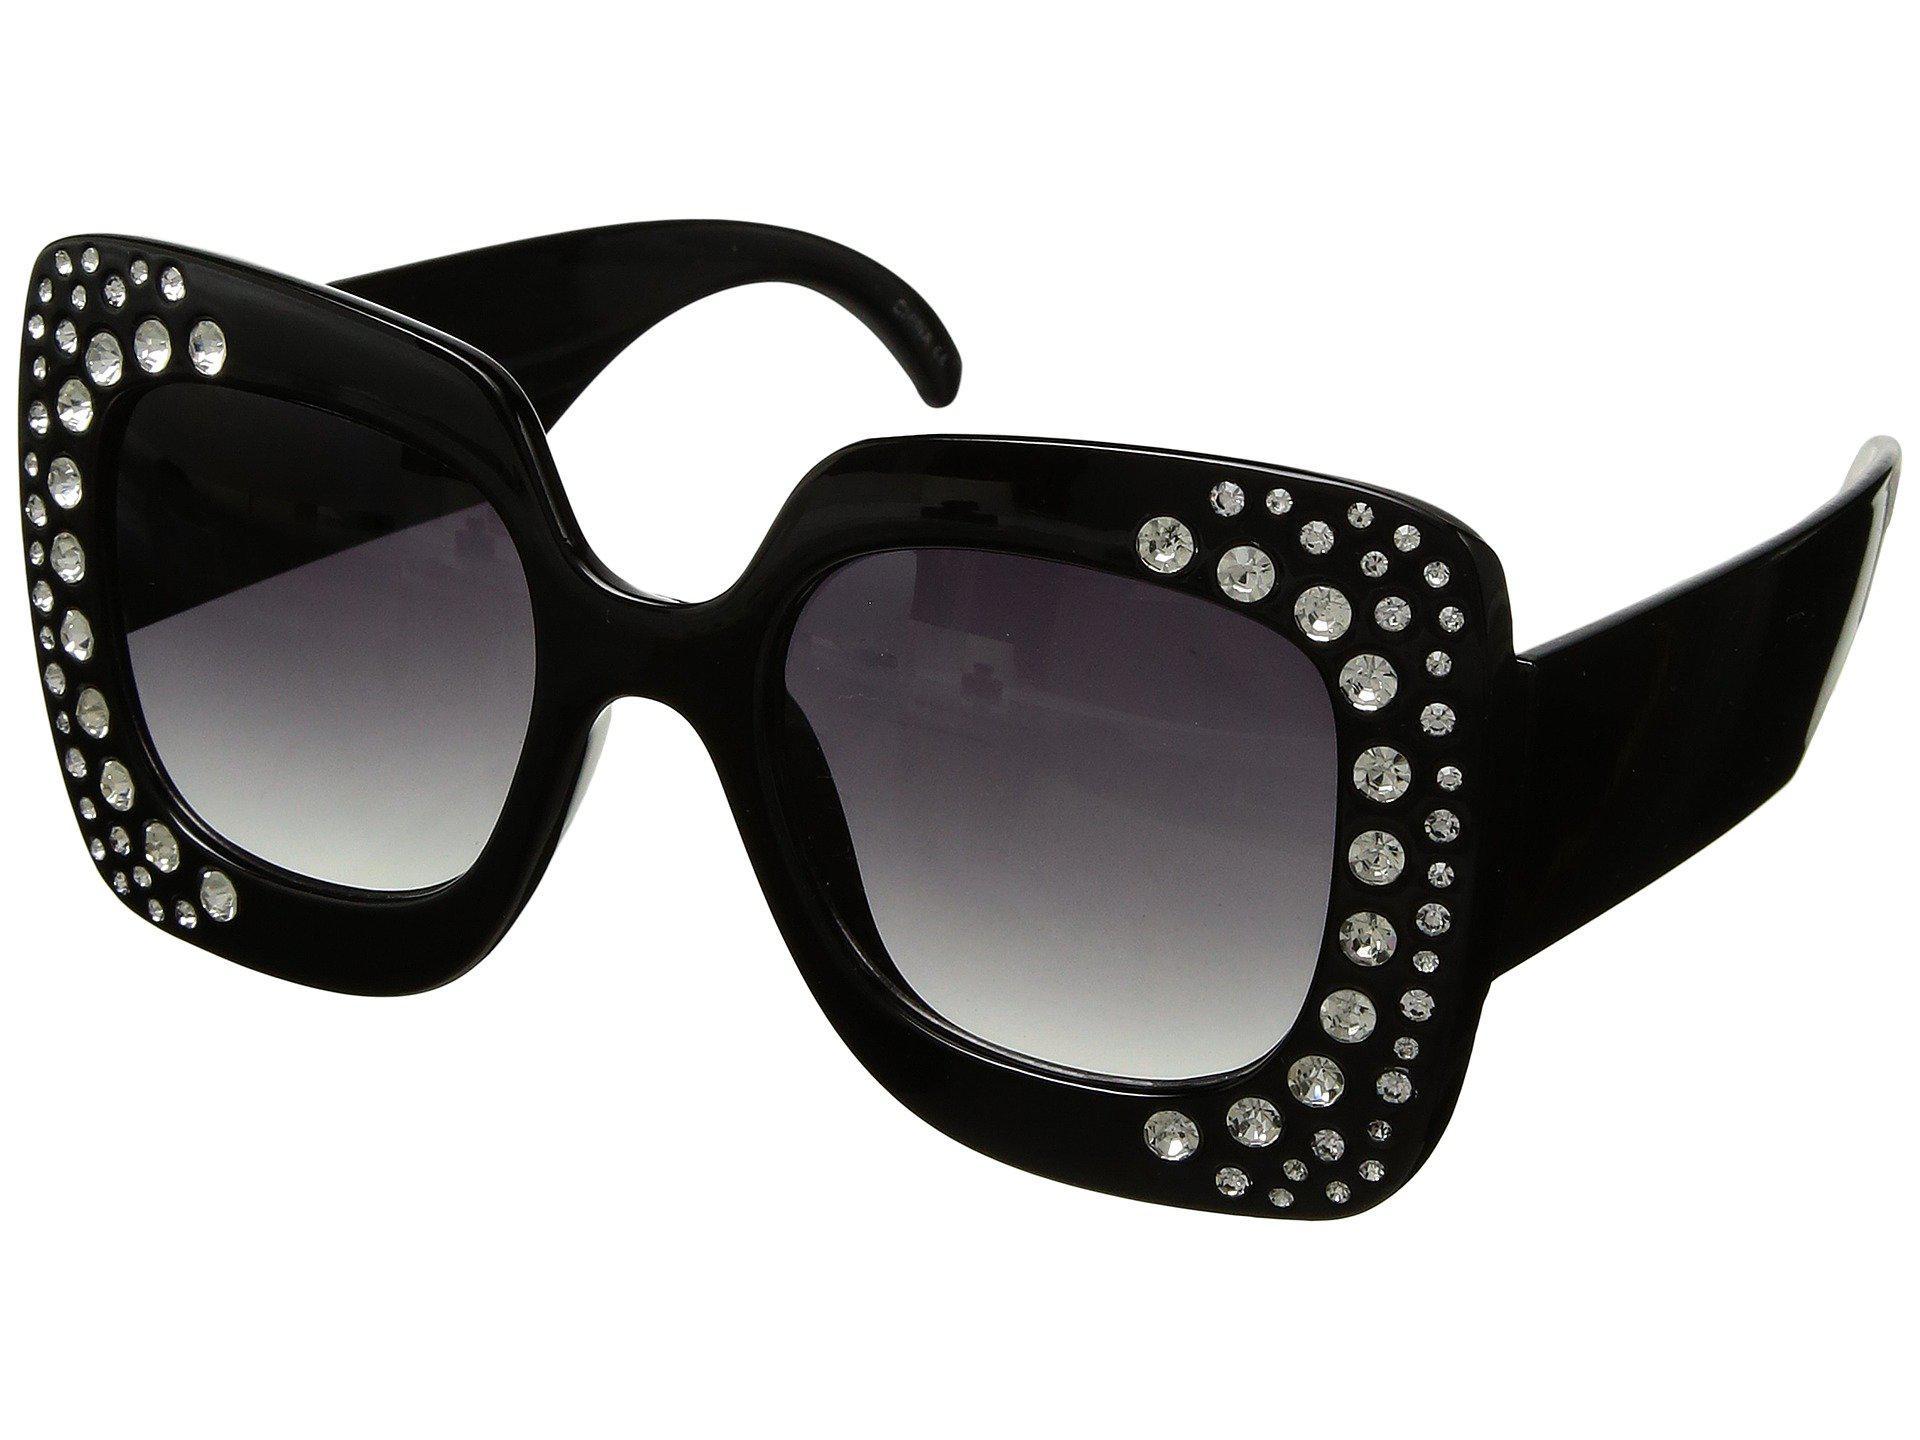 095b19cfad3f Steve Madden Bling (black) Fashion Sunglasses in Black - Lyst